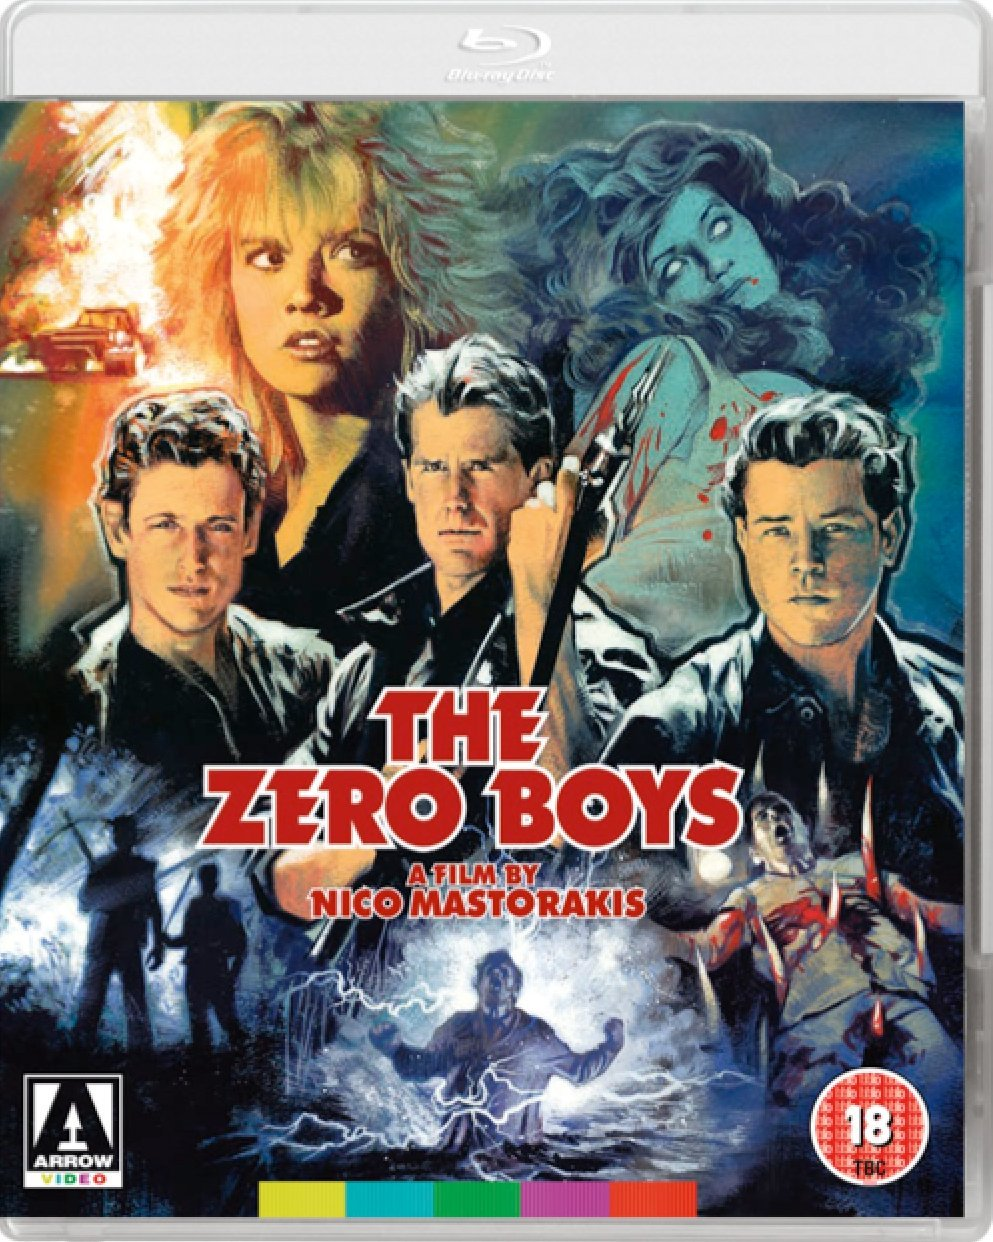 'The Zero Boys' Review (Arrow Video Blu-Ray)